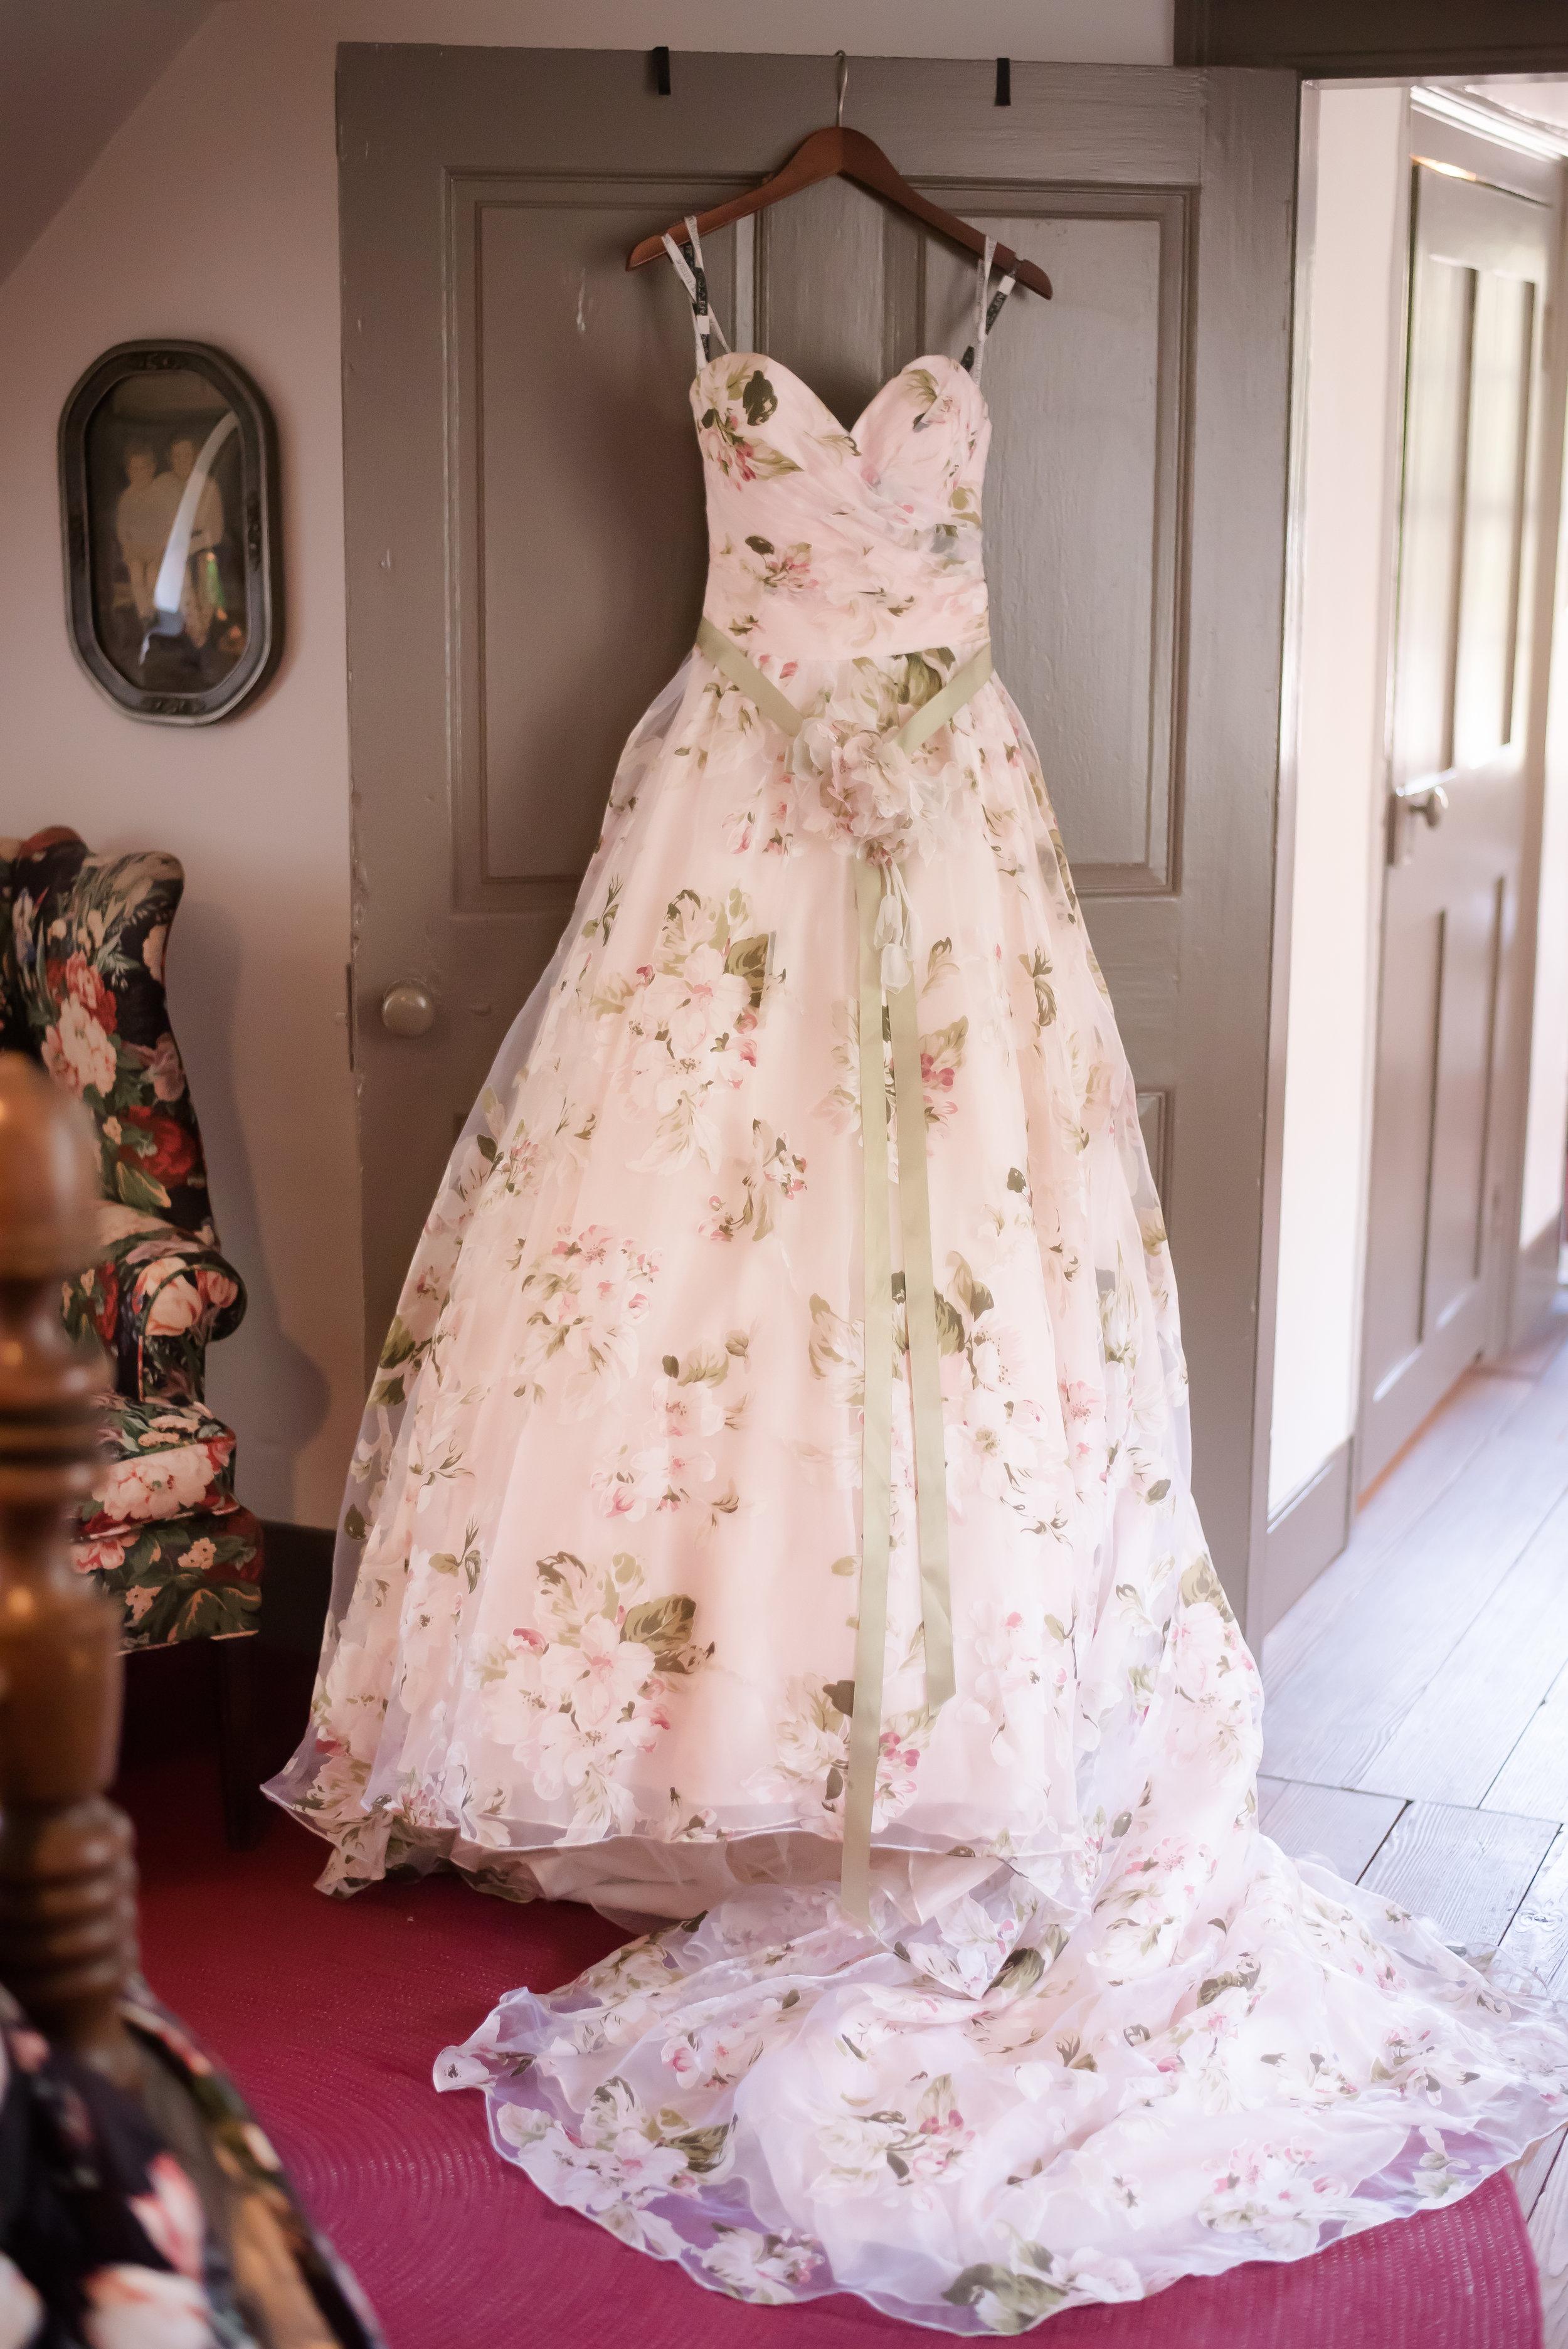 midsummers-eve-wedding-floral-blush-dress-david-tutera-cary-hill-plantation-photo-virginia-bride-11.jpg